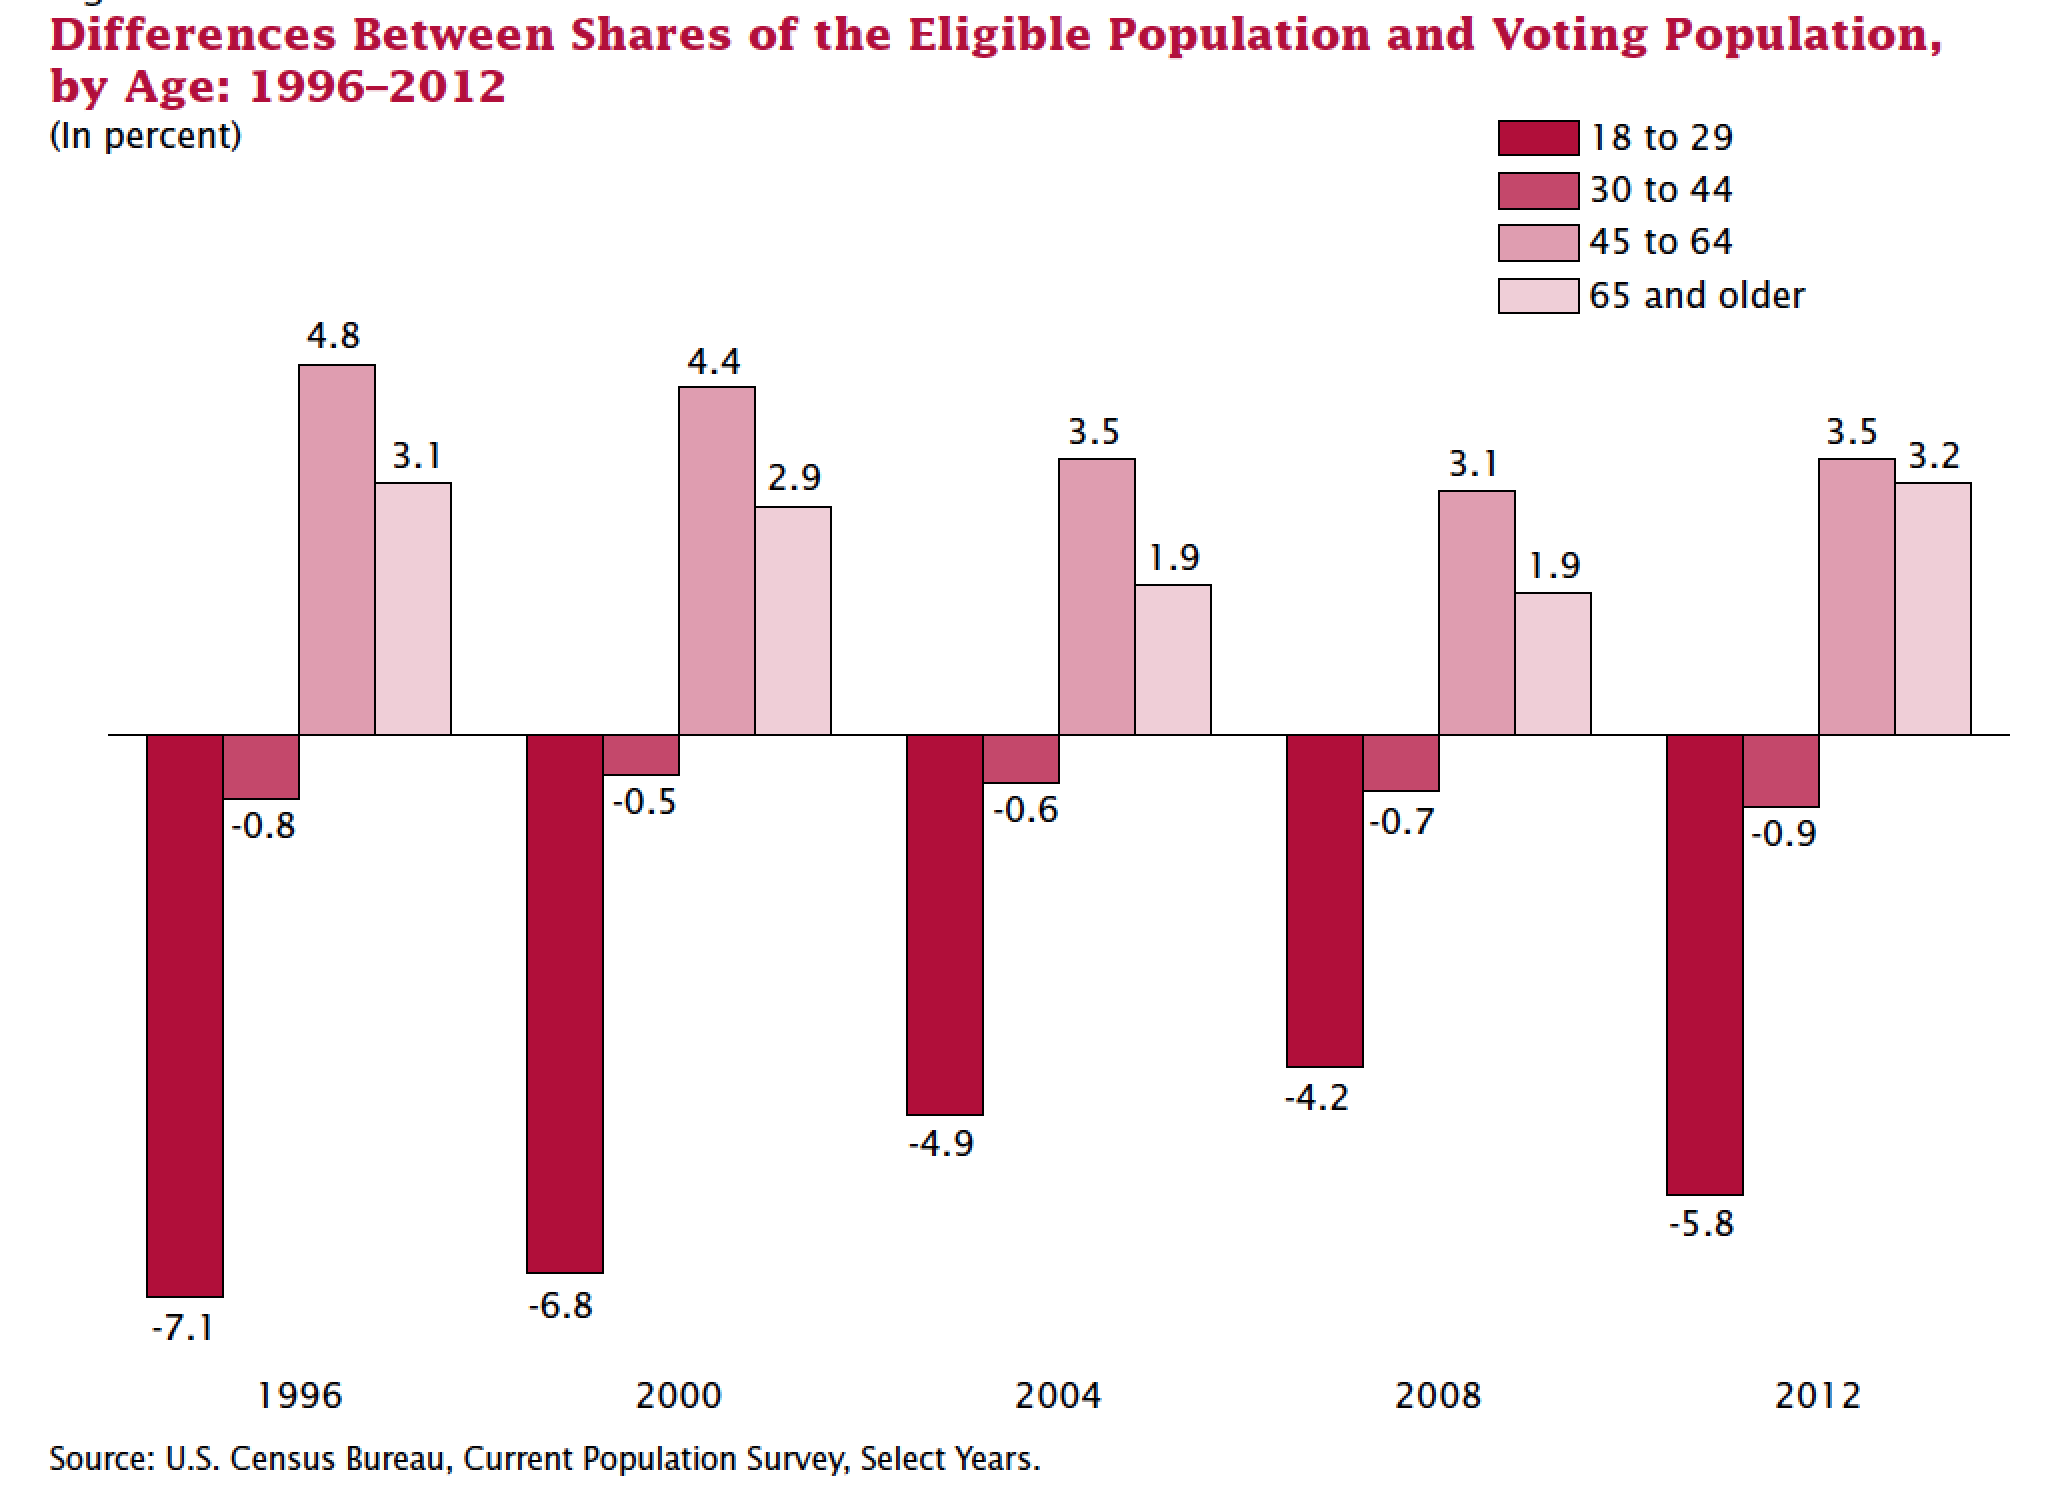 Eligible population vs. voting population